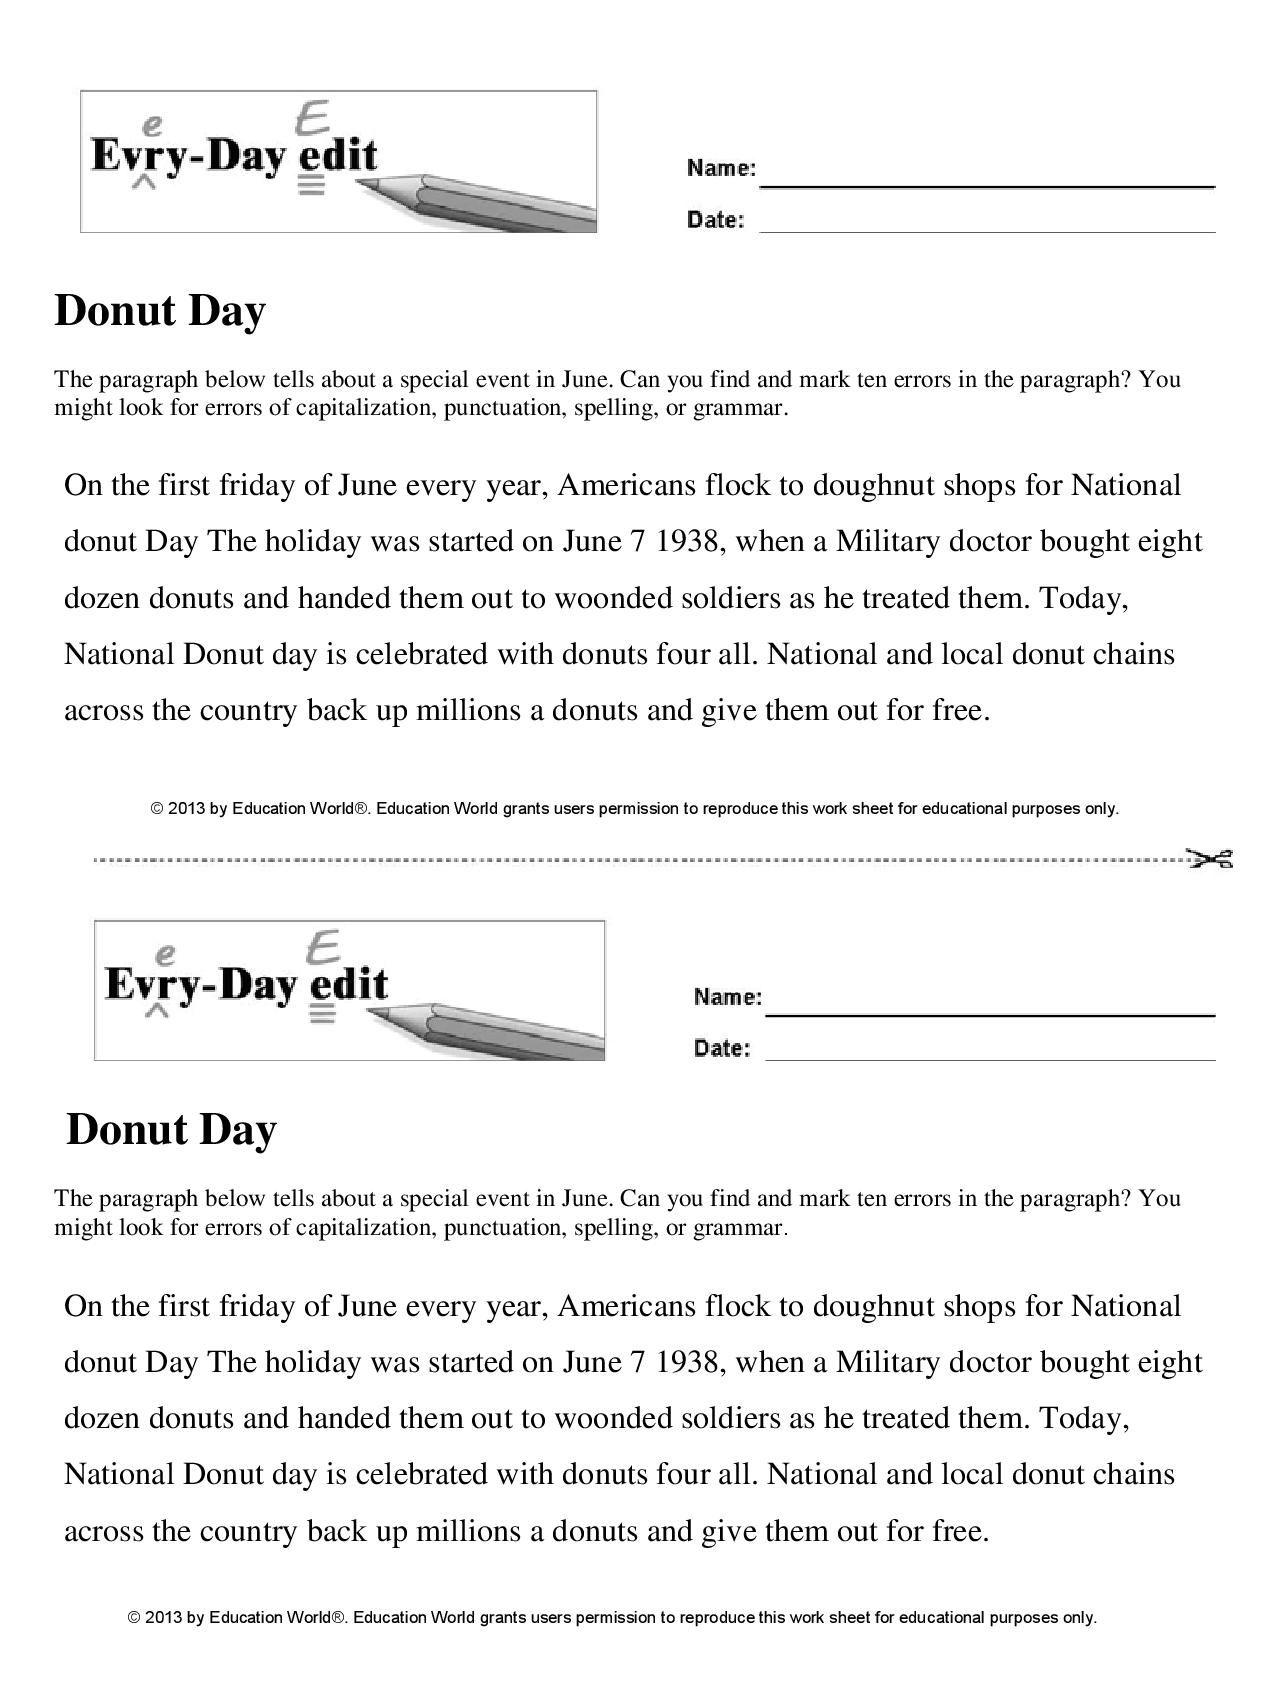 Education World Donut Day